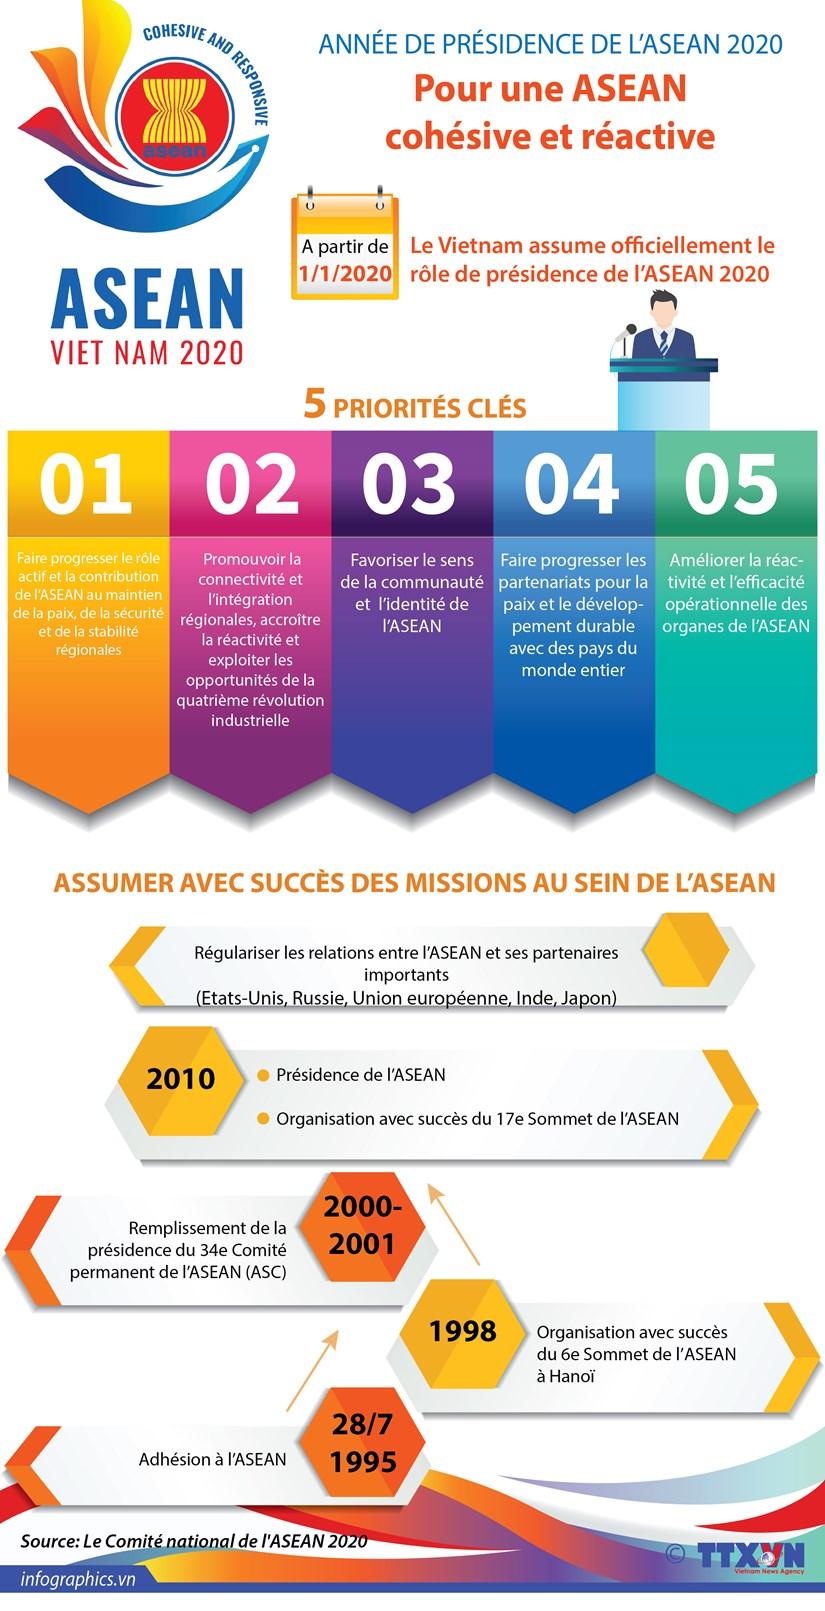 Annee de presidence de l'ASEAN 2020 : pour une ASEAN cohesive et reactive hinh anh 1